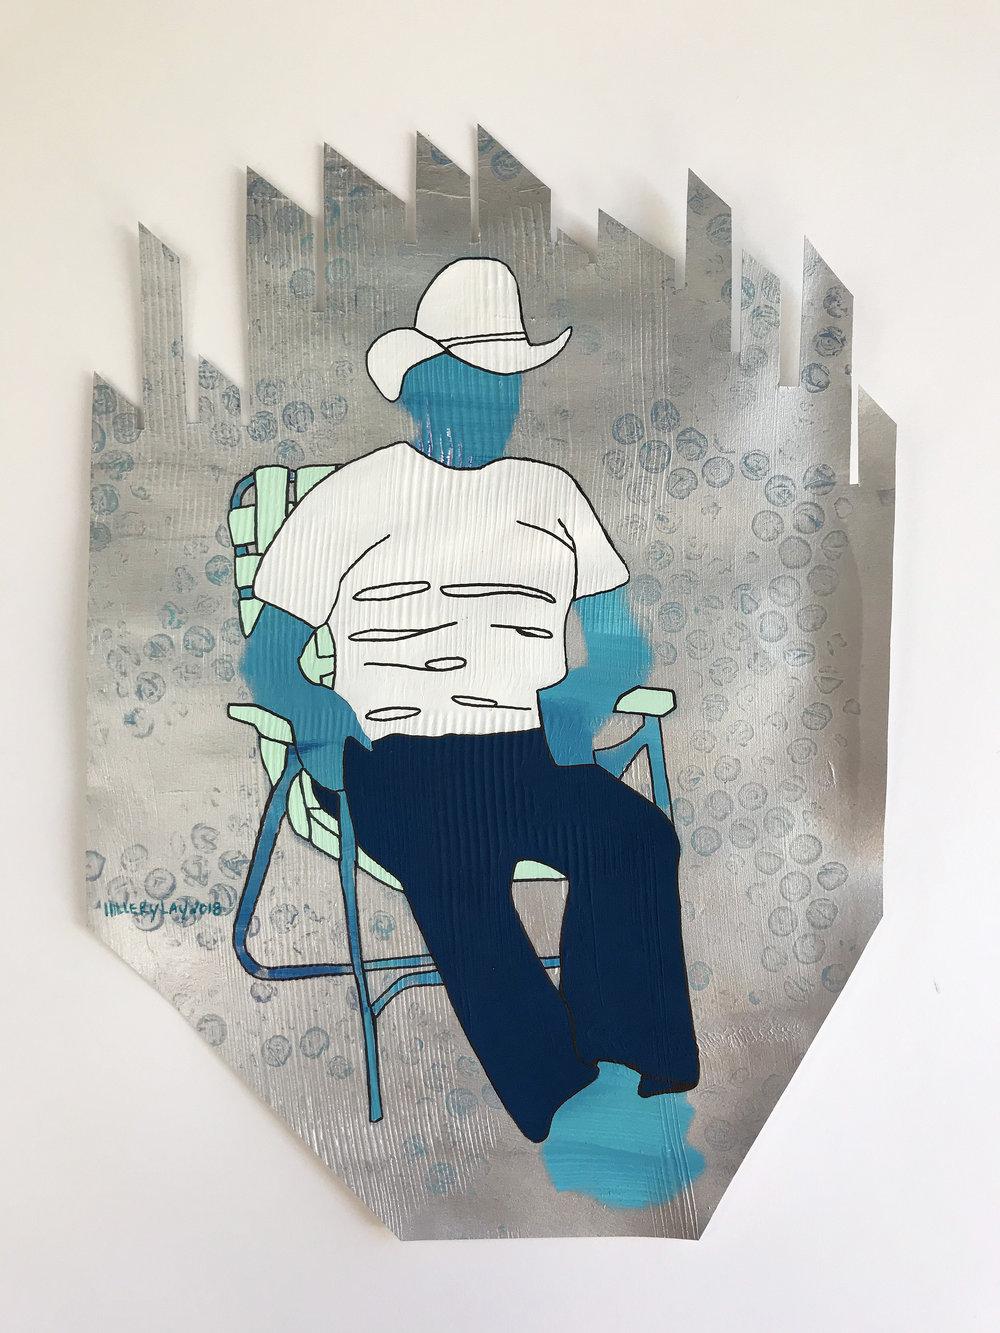 Lounge, Crabgrass Paper-Cut 2018 mm 10x14 inches